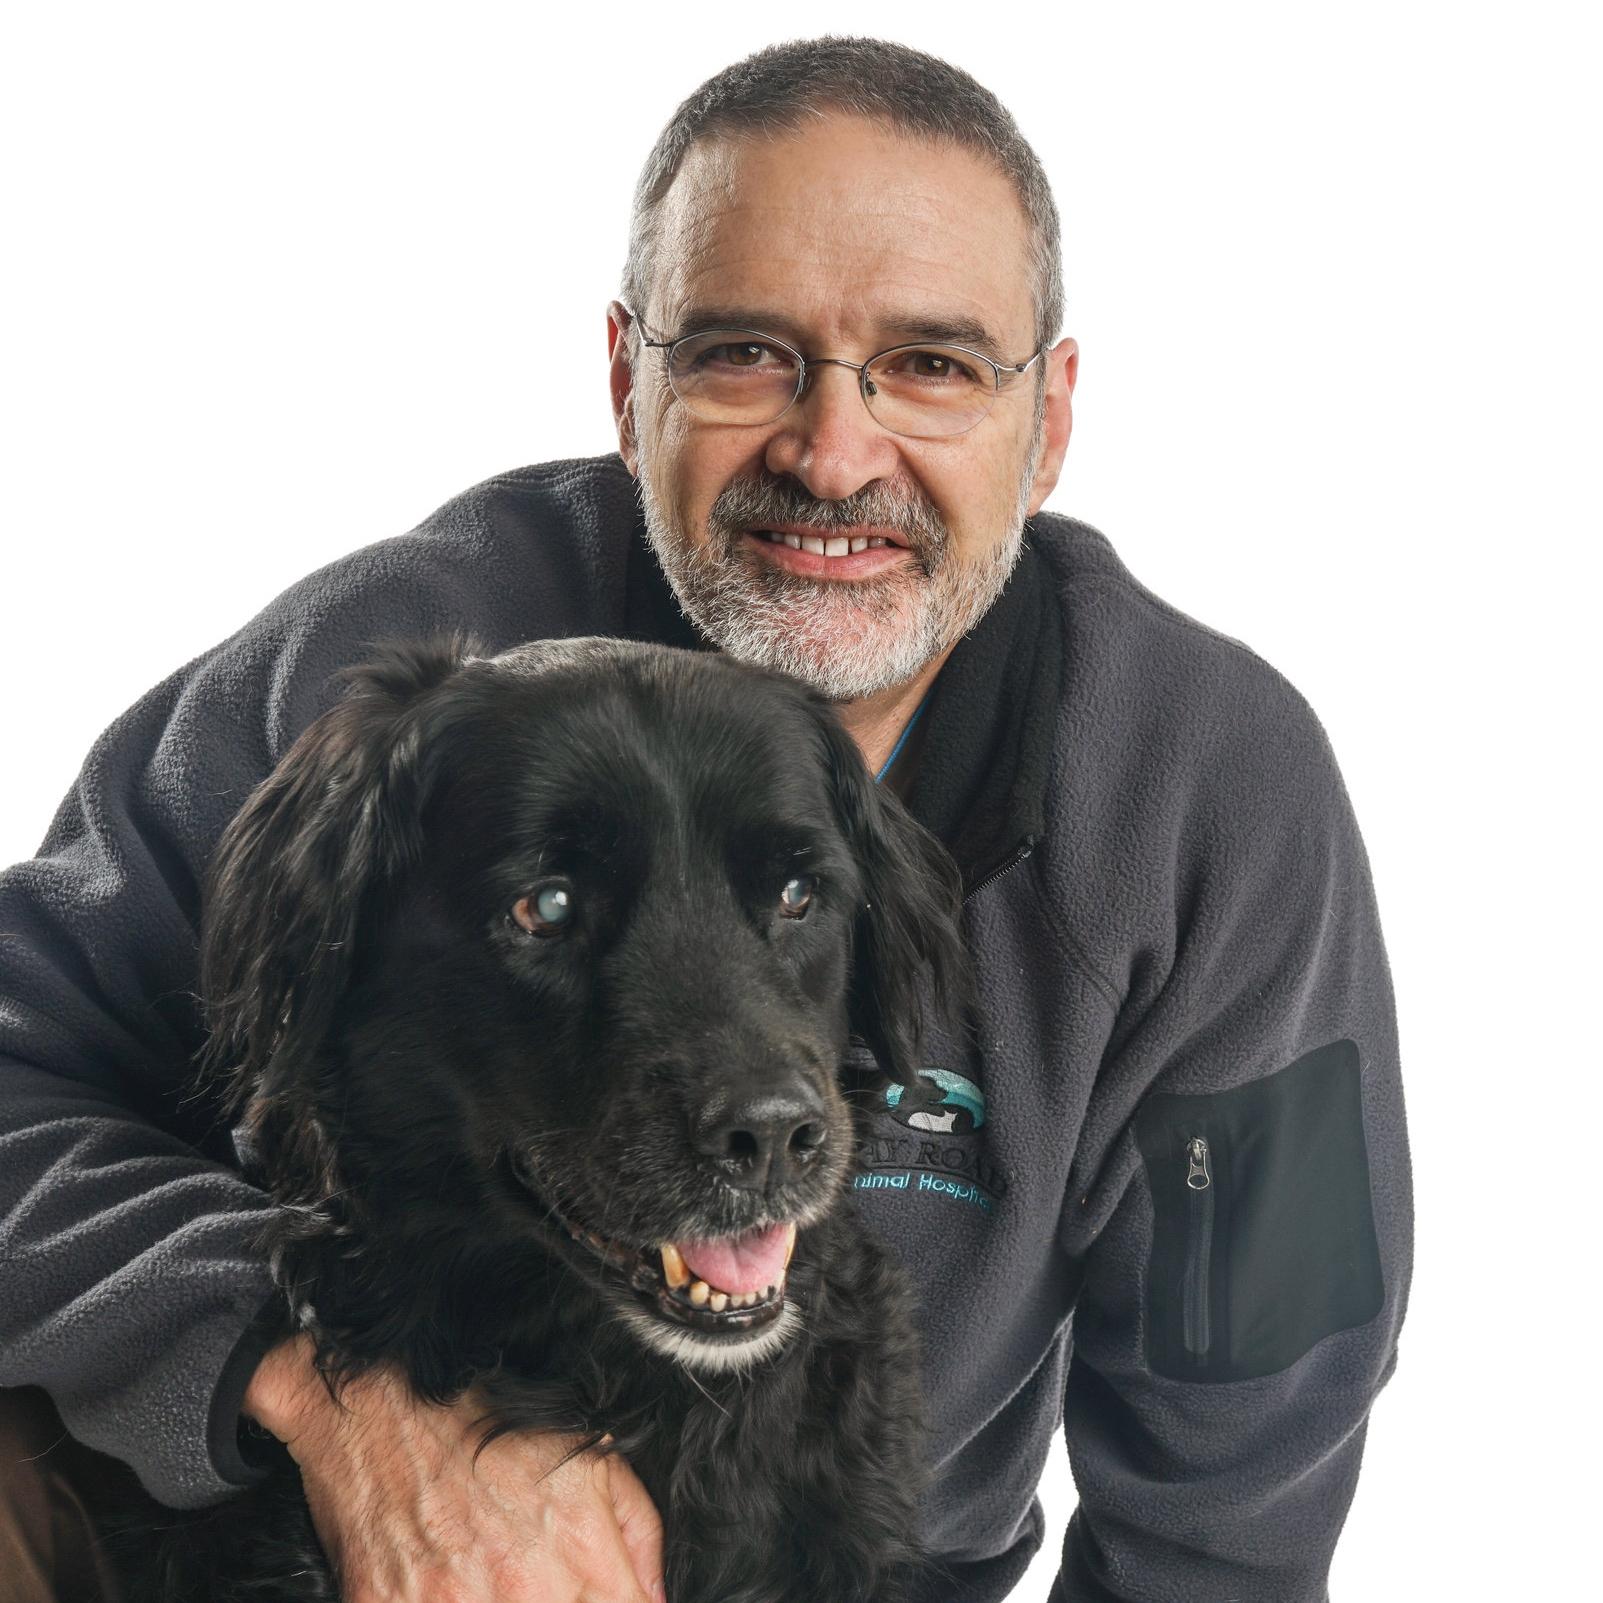 Dr. Mark Swaney